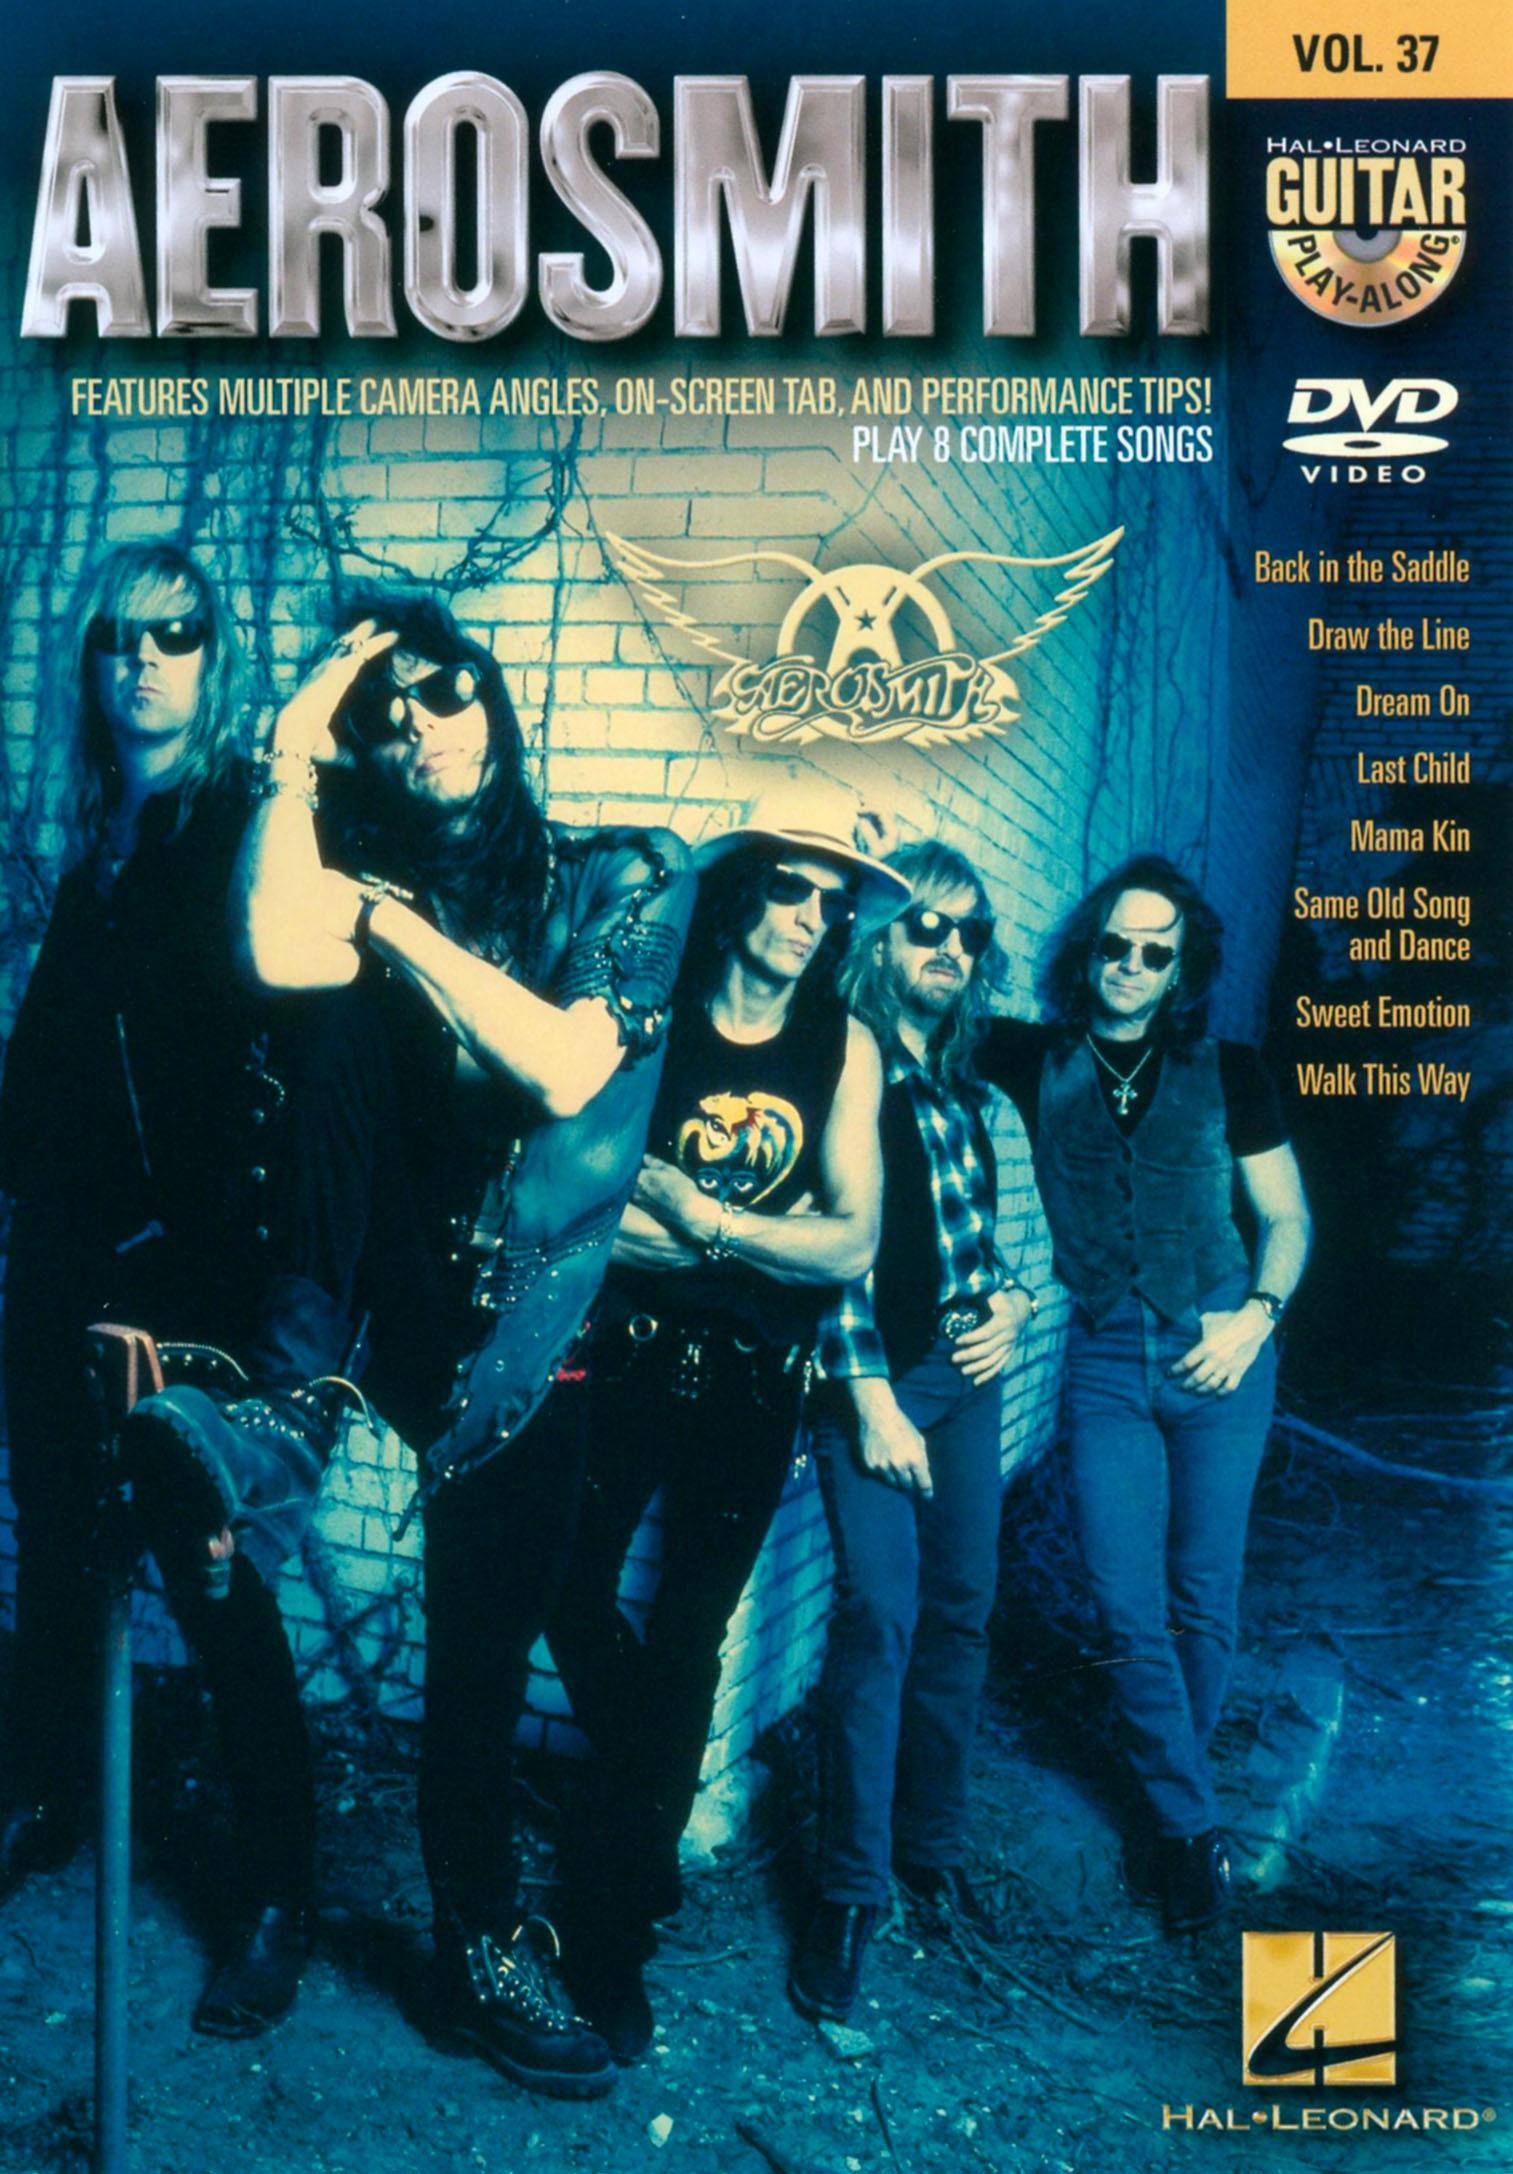 Guitar Play-Along, Vol. 37: Aerosmith